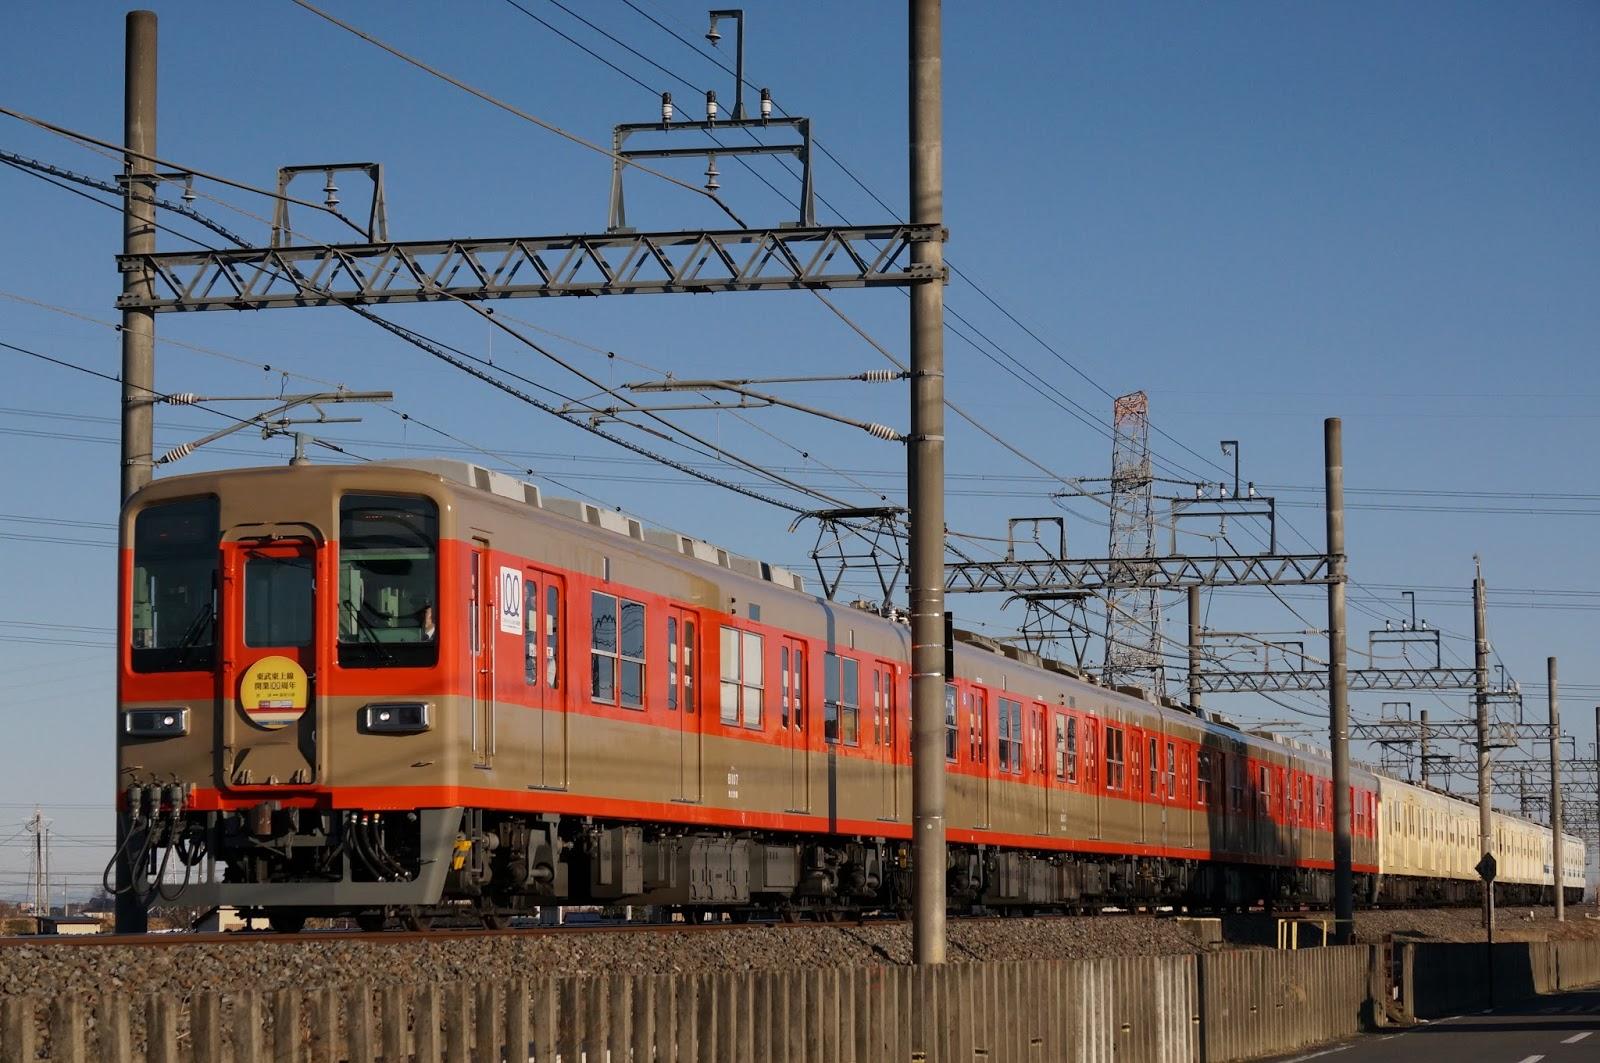 81107F+81111F+8506Fを使った8000系の歴代カラーリングの特別編成列車